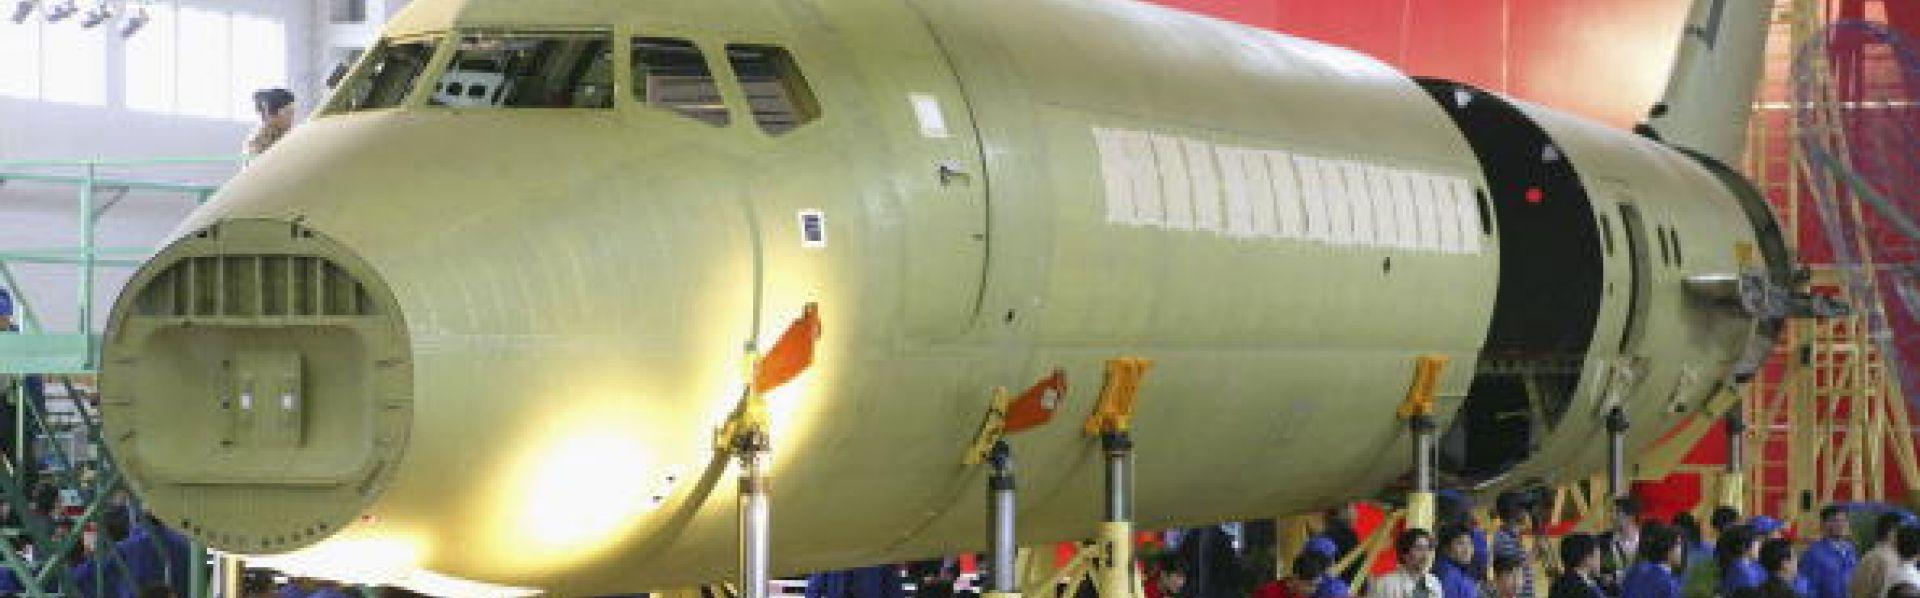 Resultado de imagen para avic aircraft factory